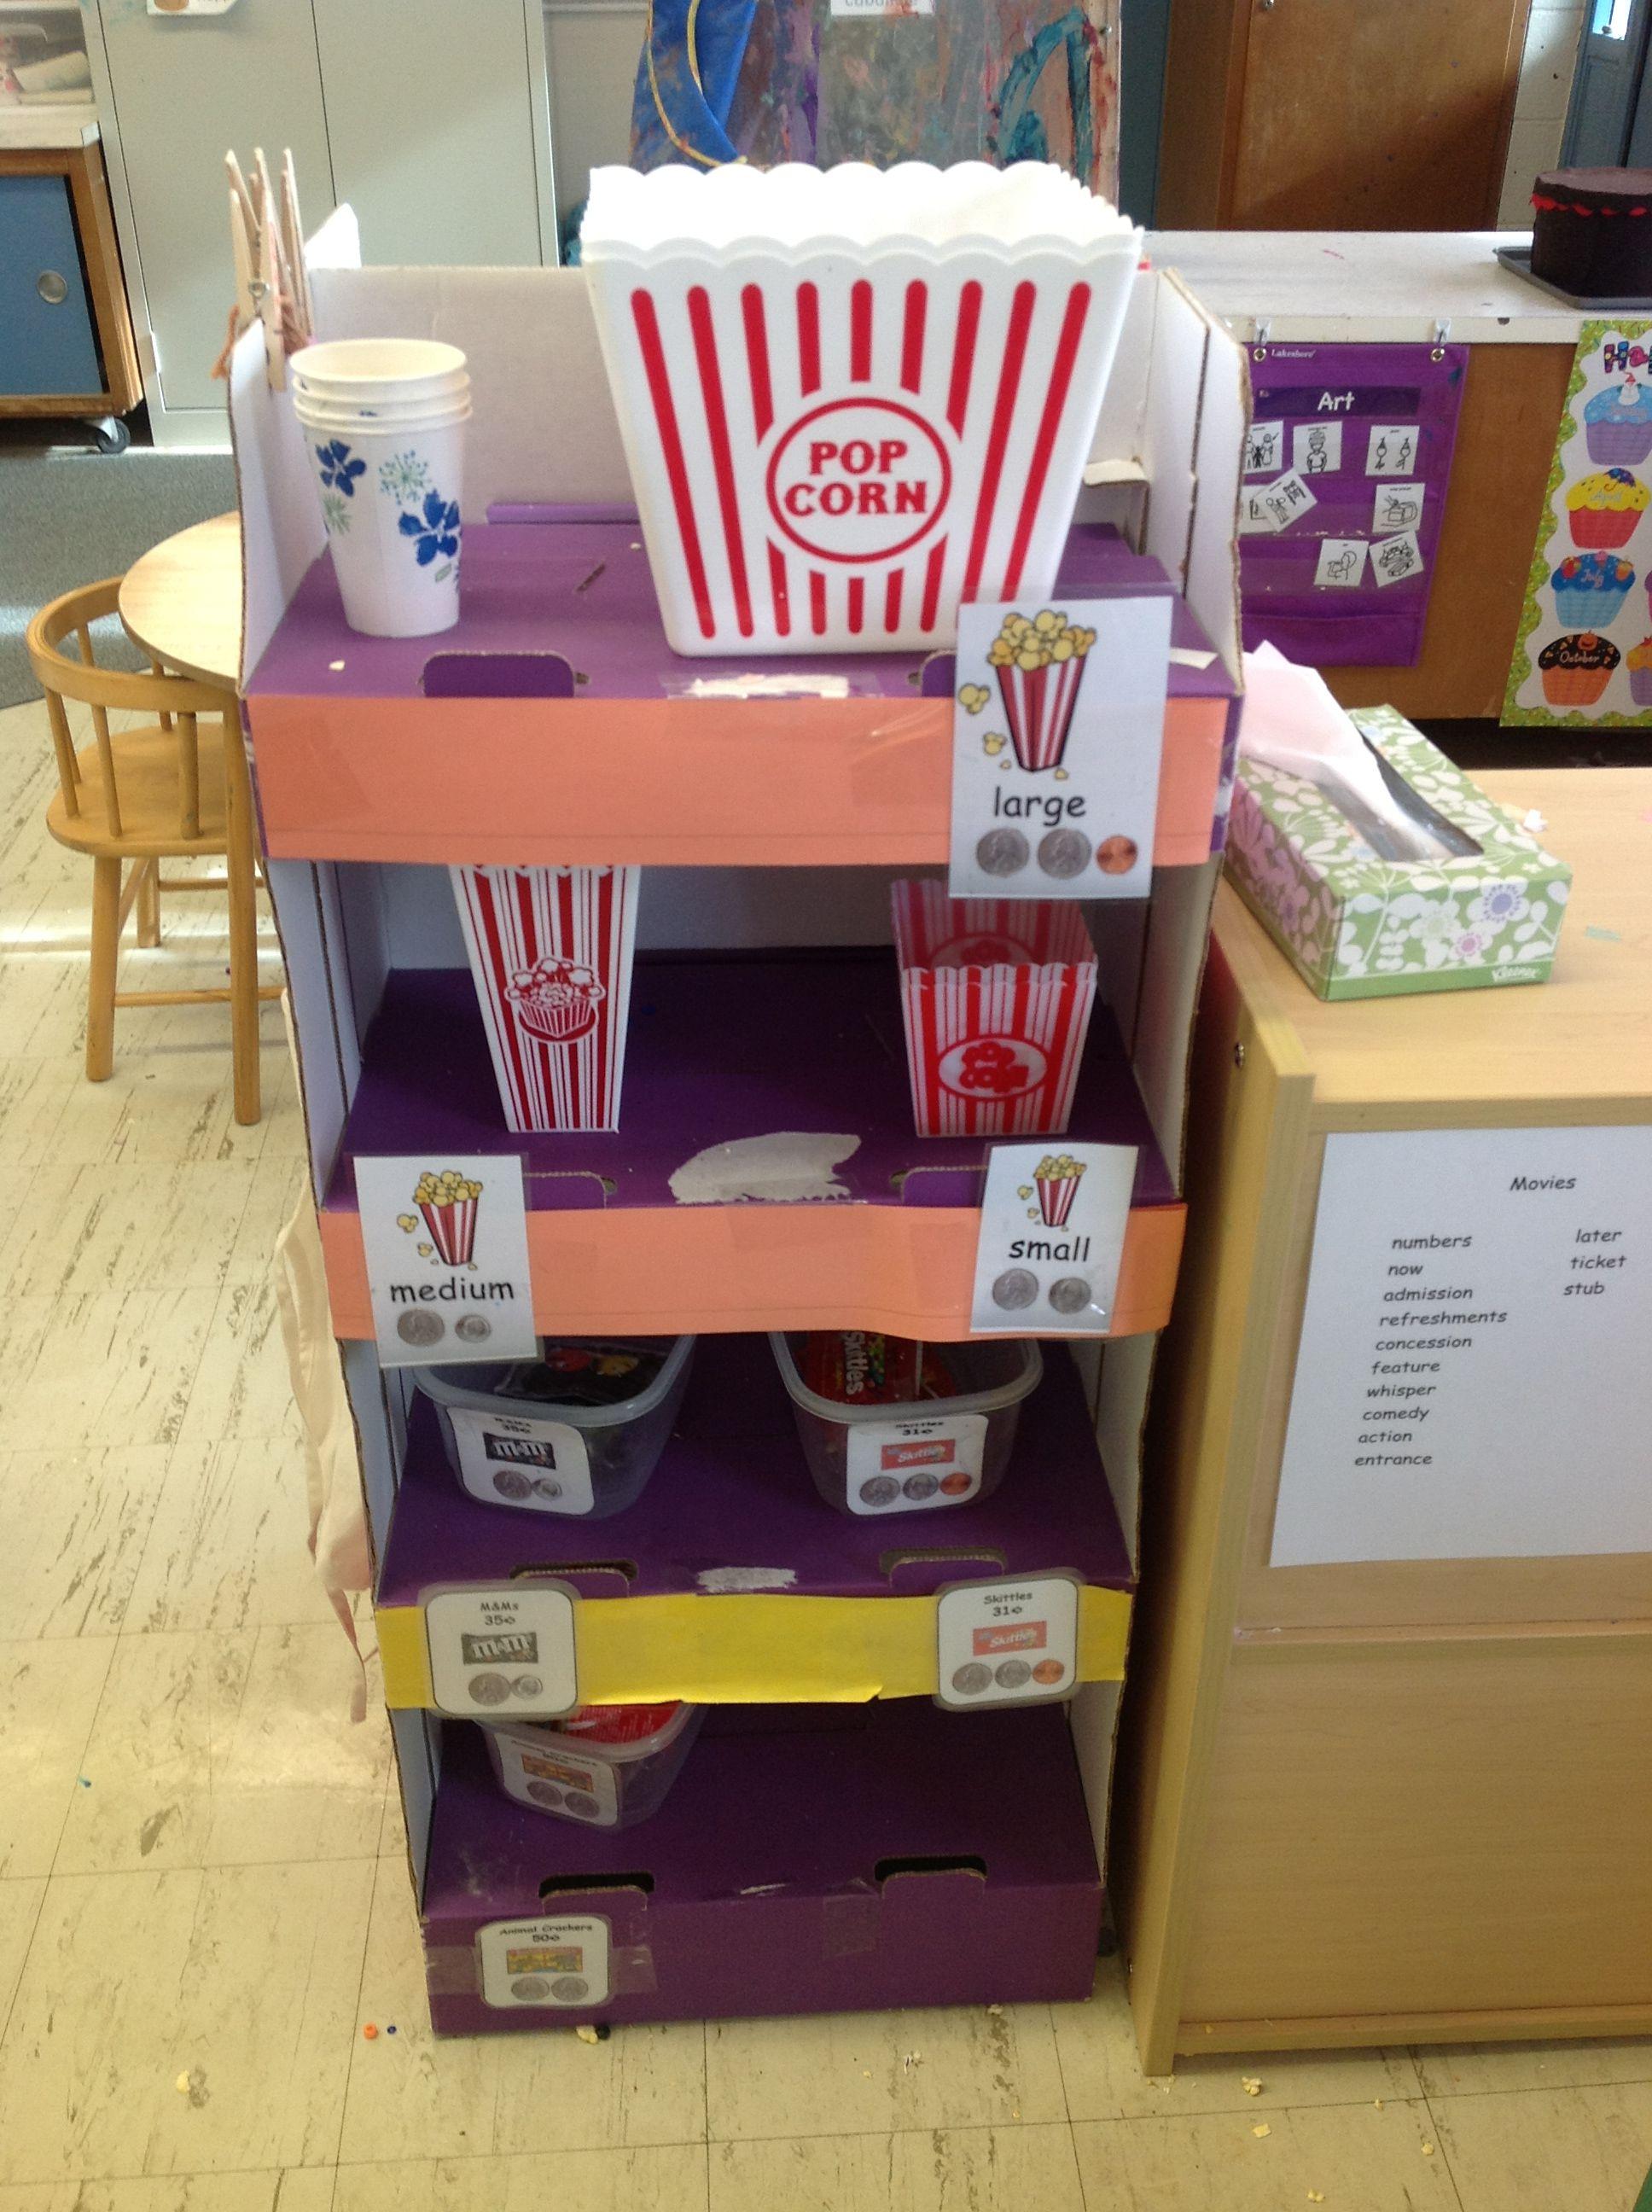 Movie theater at Pleasant View Preschool popcorn (small